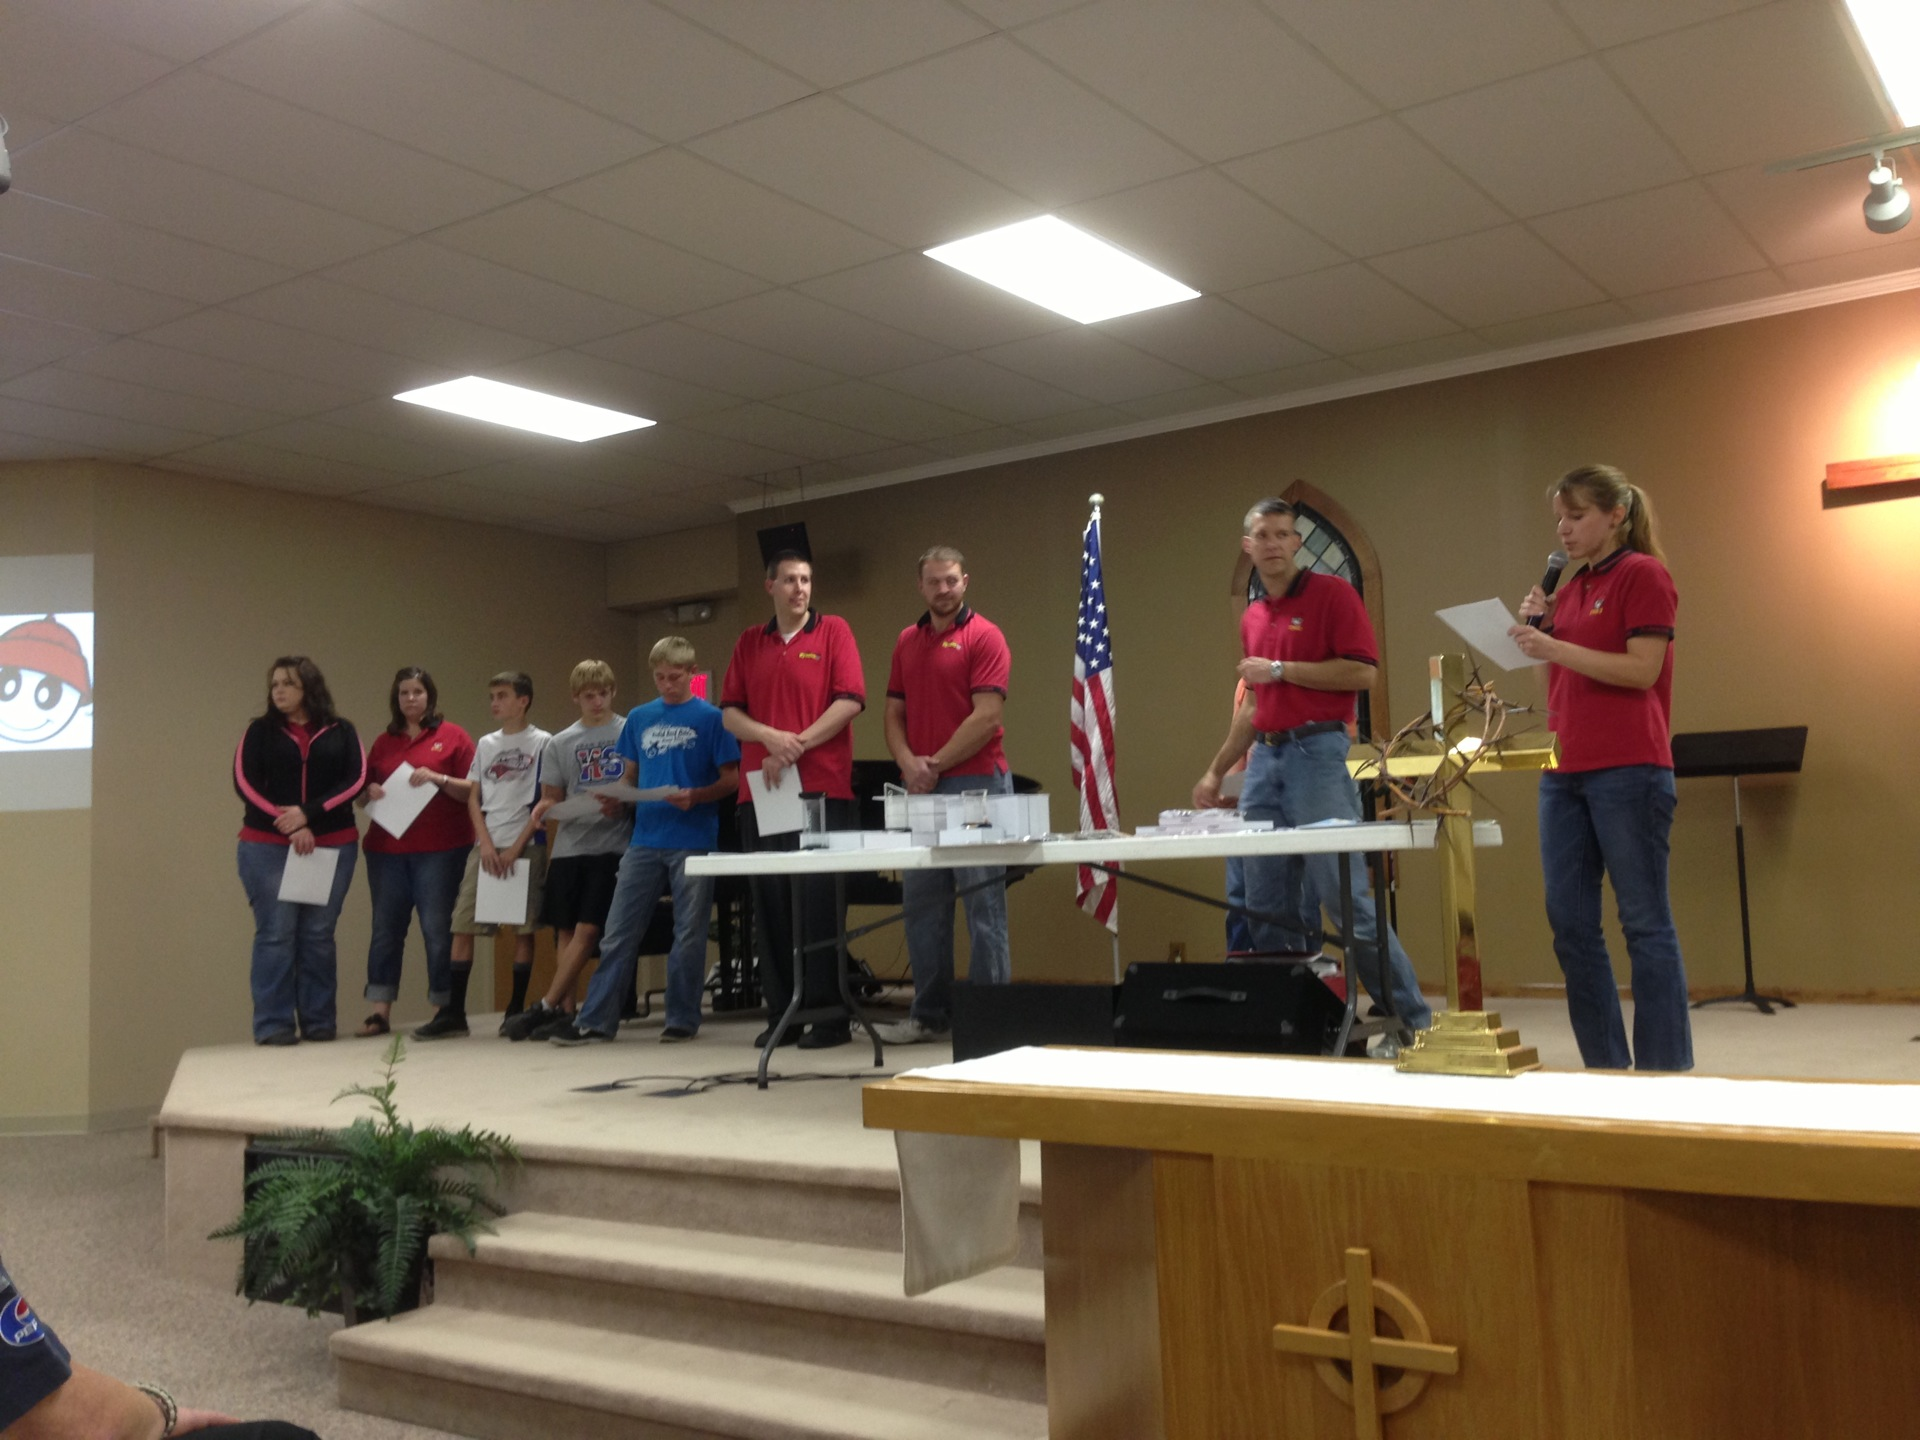 Grace Community Church | 210 Mckinley St, Great Bend, KS, 67530 | +1 (620) 792-7814